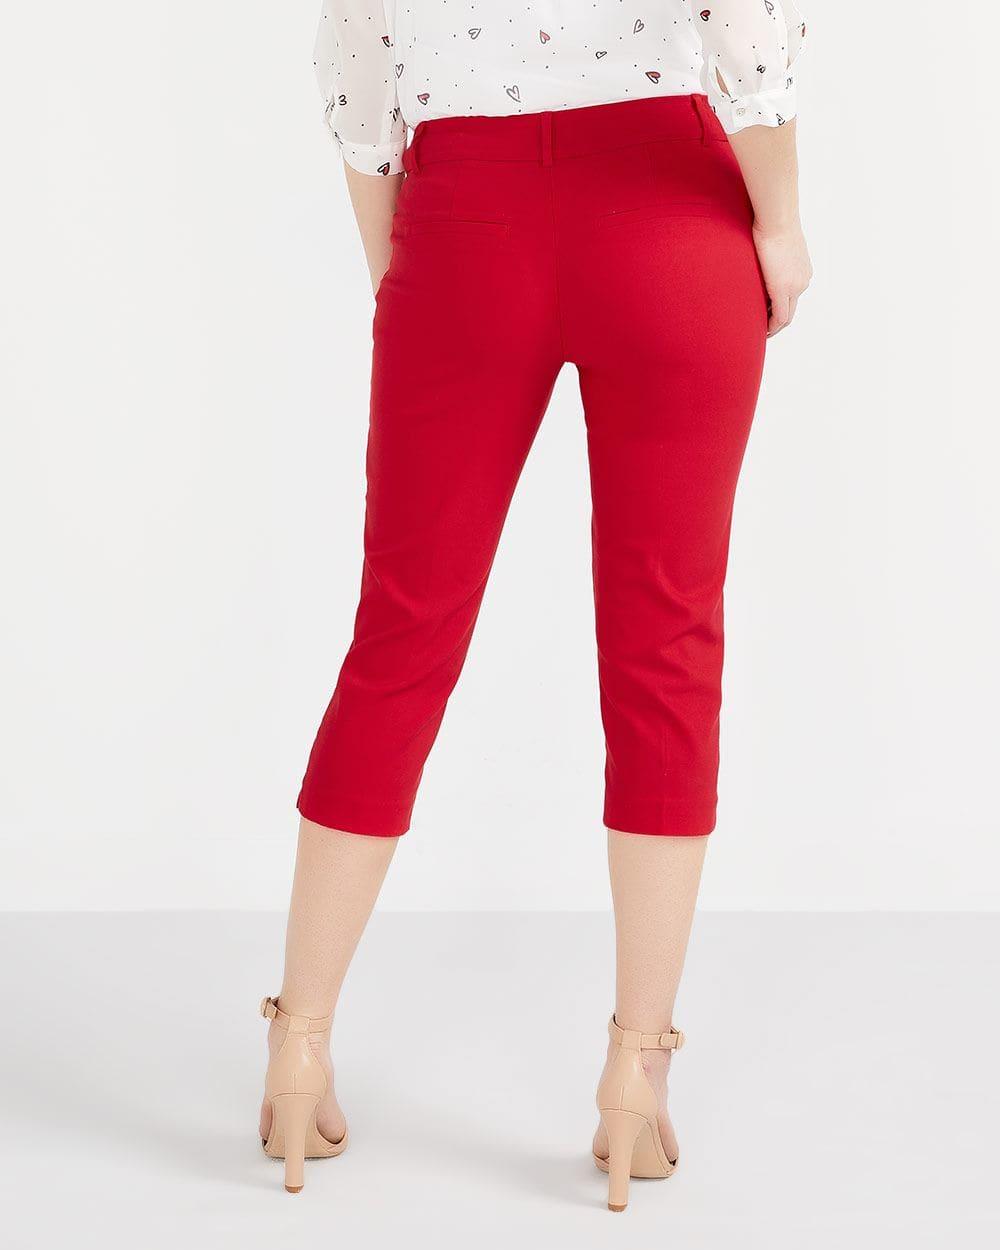 The Solid Iconic Capri Pants